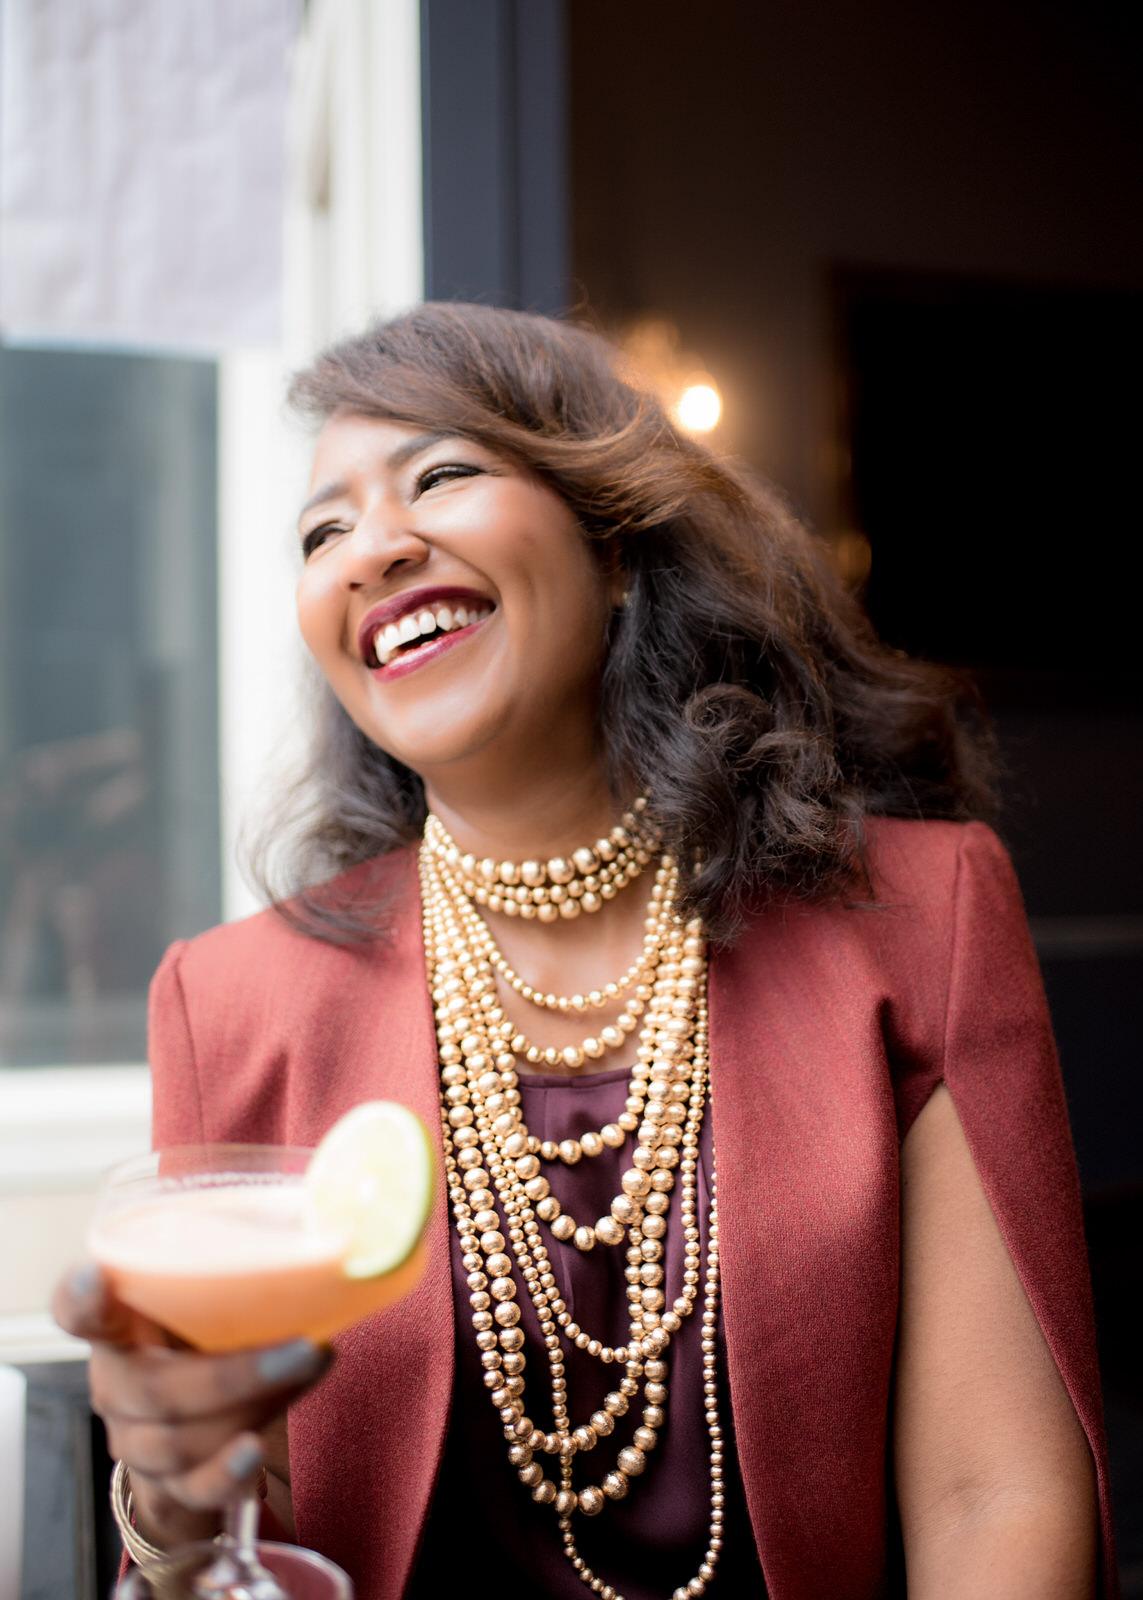 Tausha Robertson MsXFactor Multicultural African American Portrait Cocktail Vintage.jpg